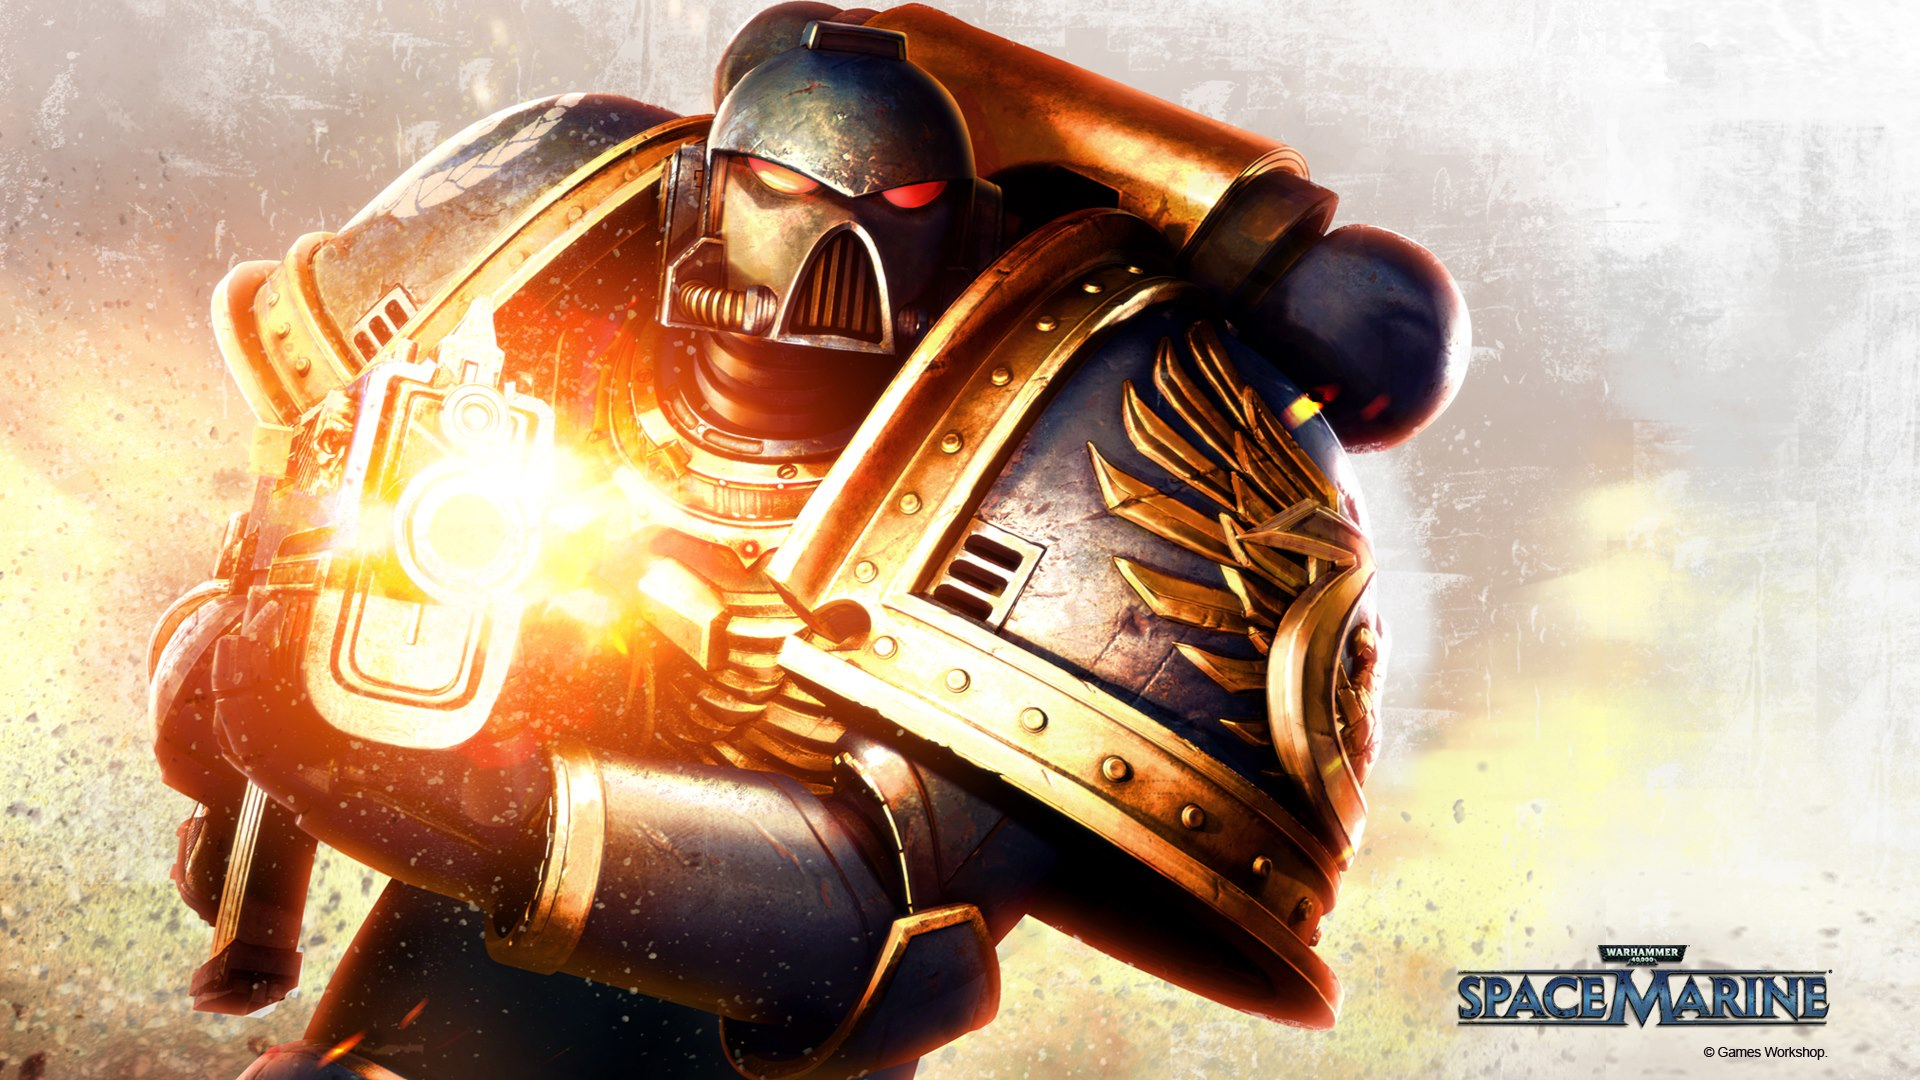 Warhammer 40k Space Marines: Space Marine Wallpapers Image